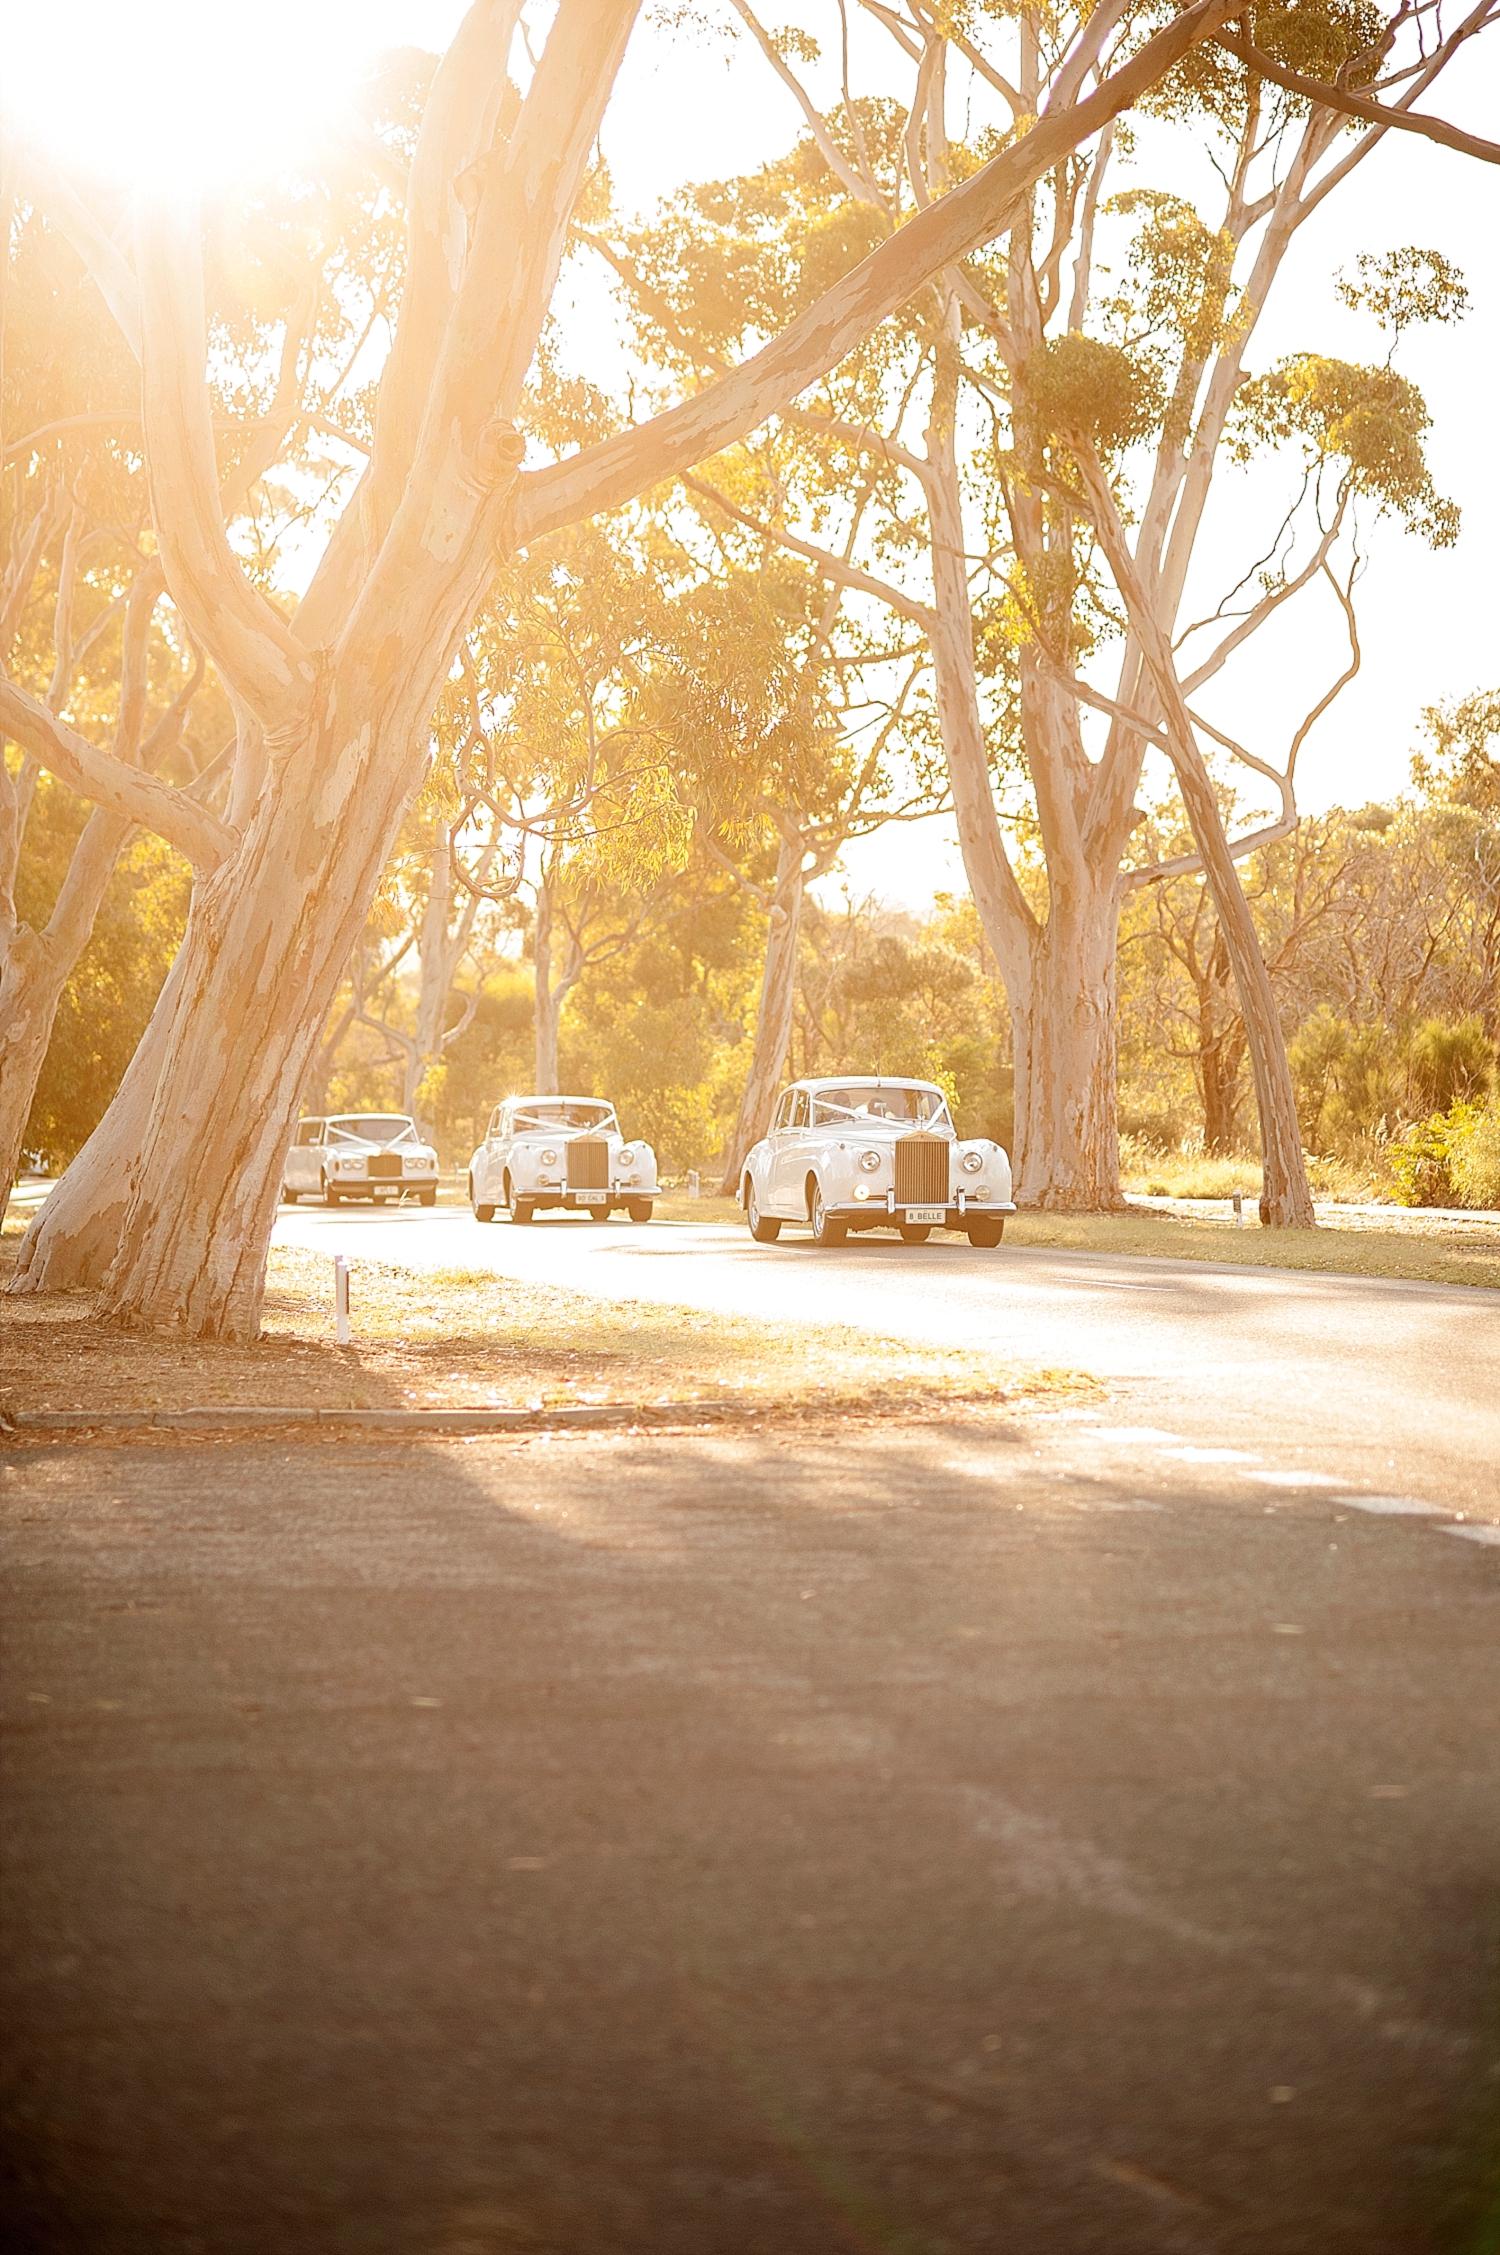 48_fleet of vintage cars wedding perth.jpg